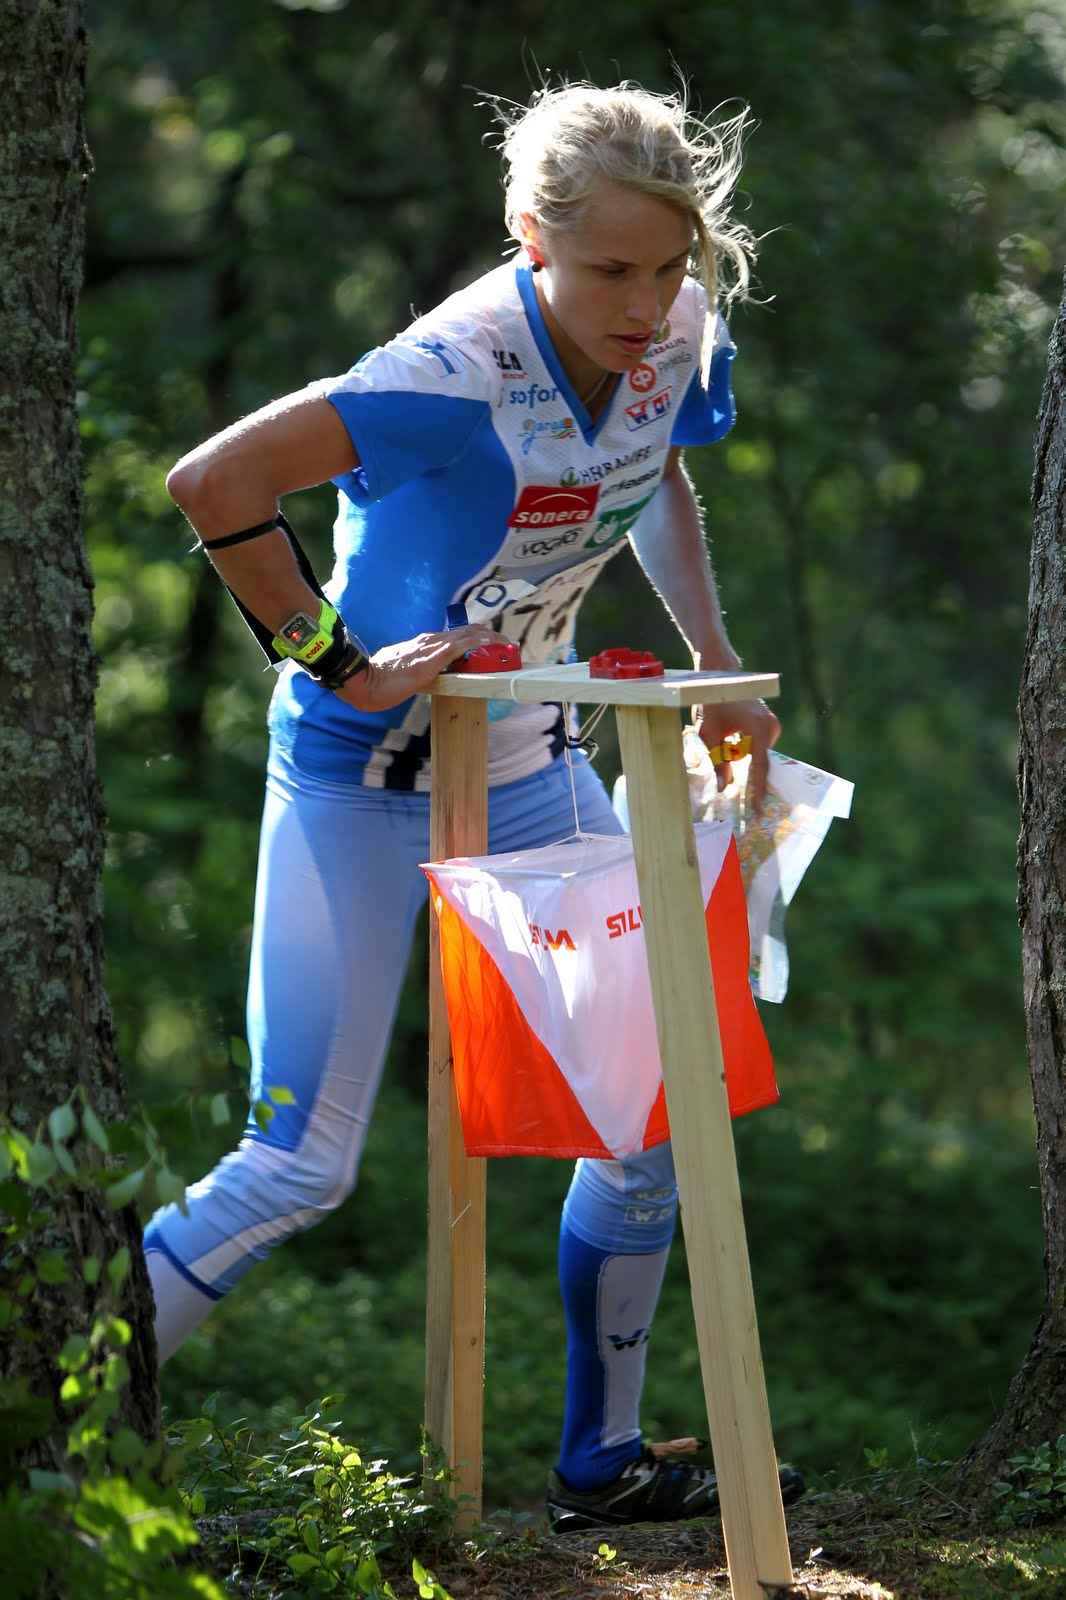 Minna Kauppi vuonna 2010. Torben Utzon, CC BY-SA 3.0 via Wikimedia Commons